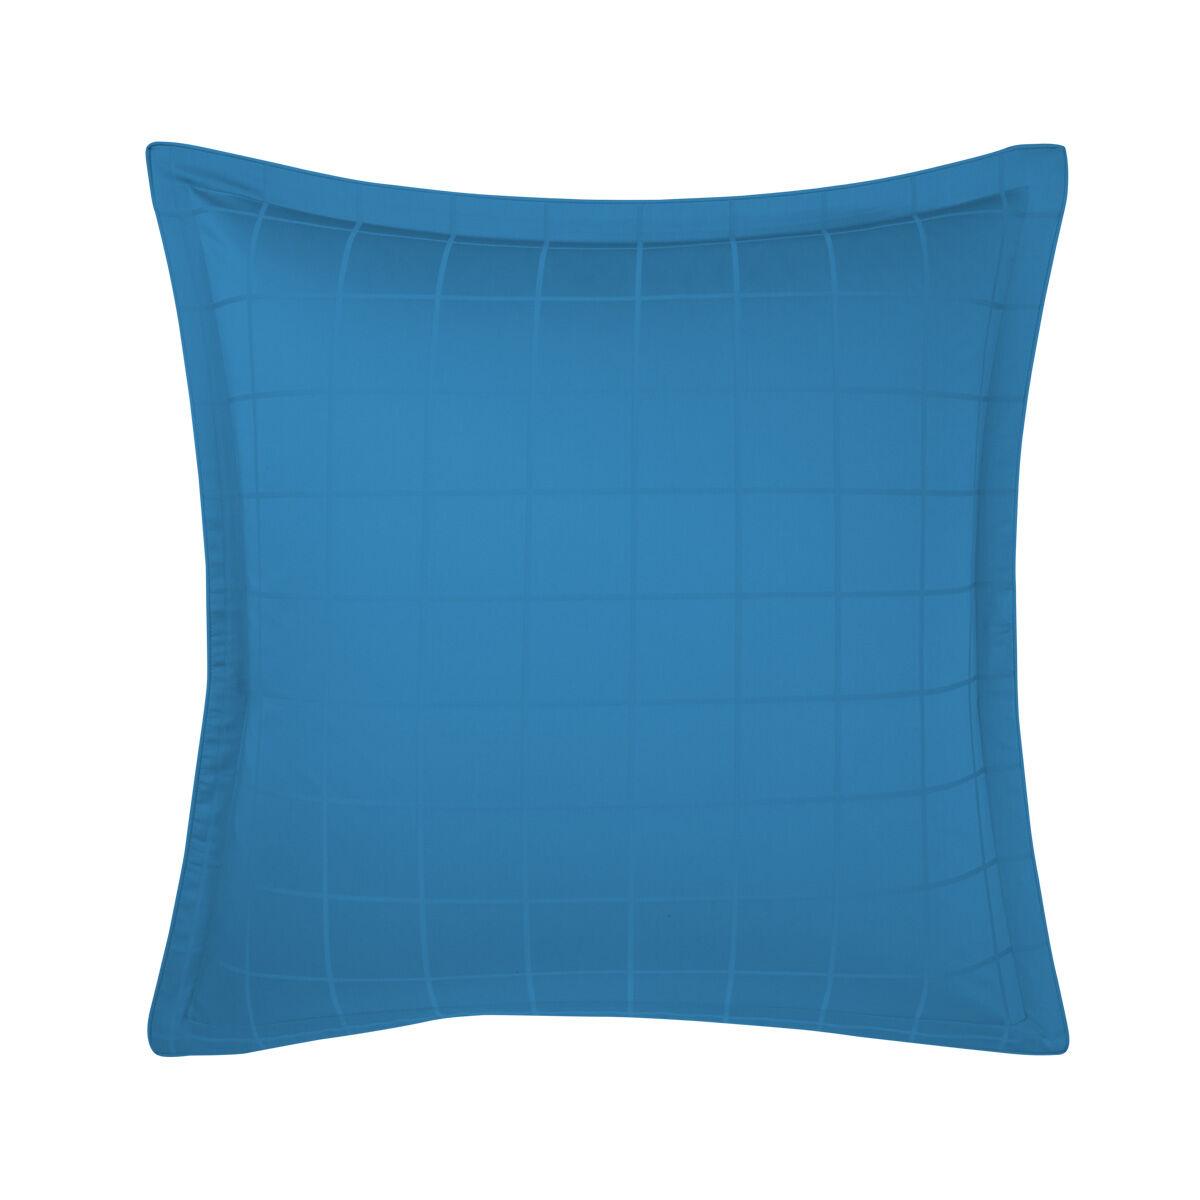 Olivier Desforges Taie d'oreiller satin Bleu 65 x 65 cm